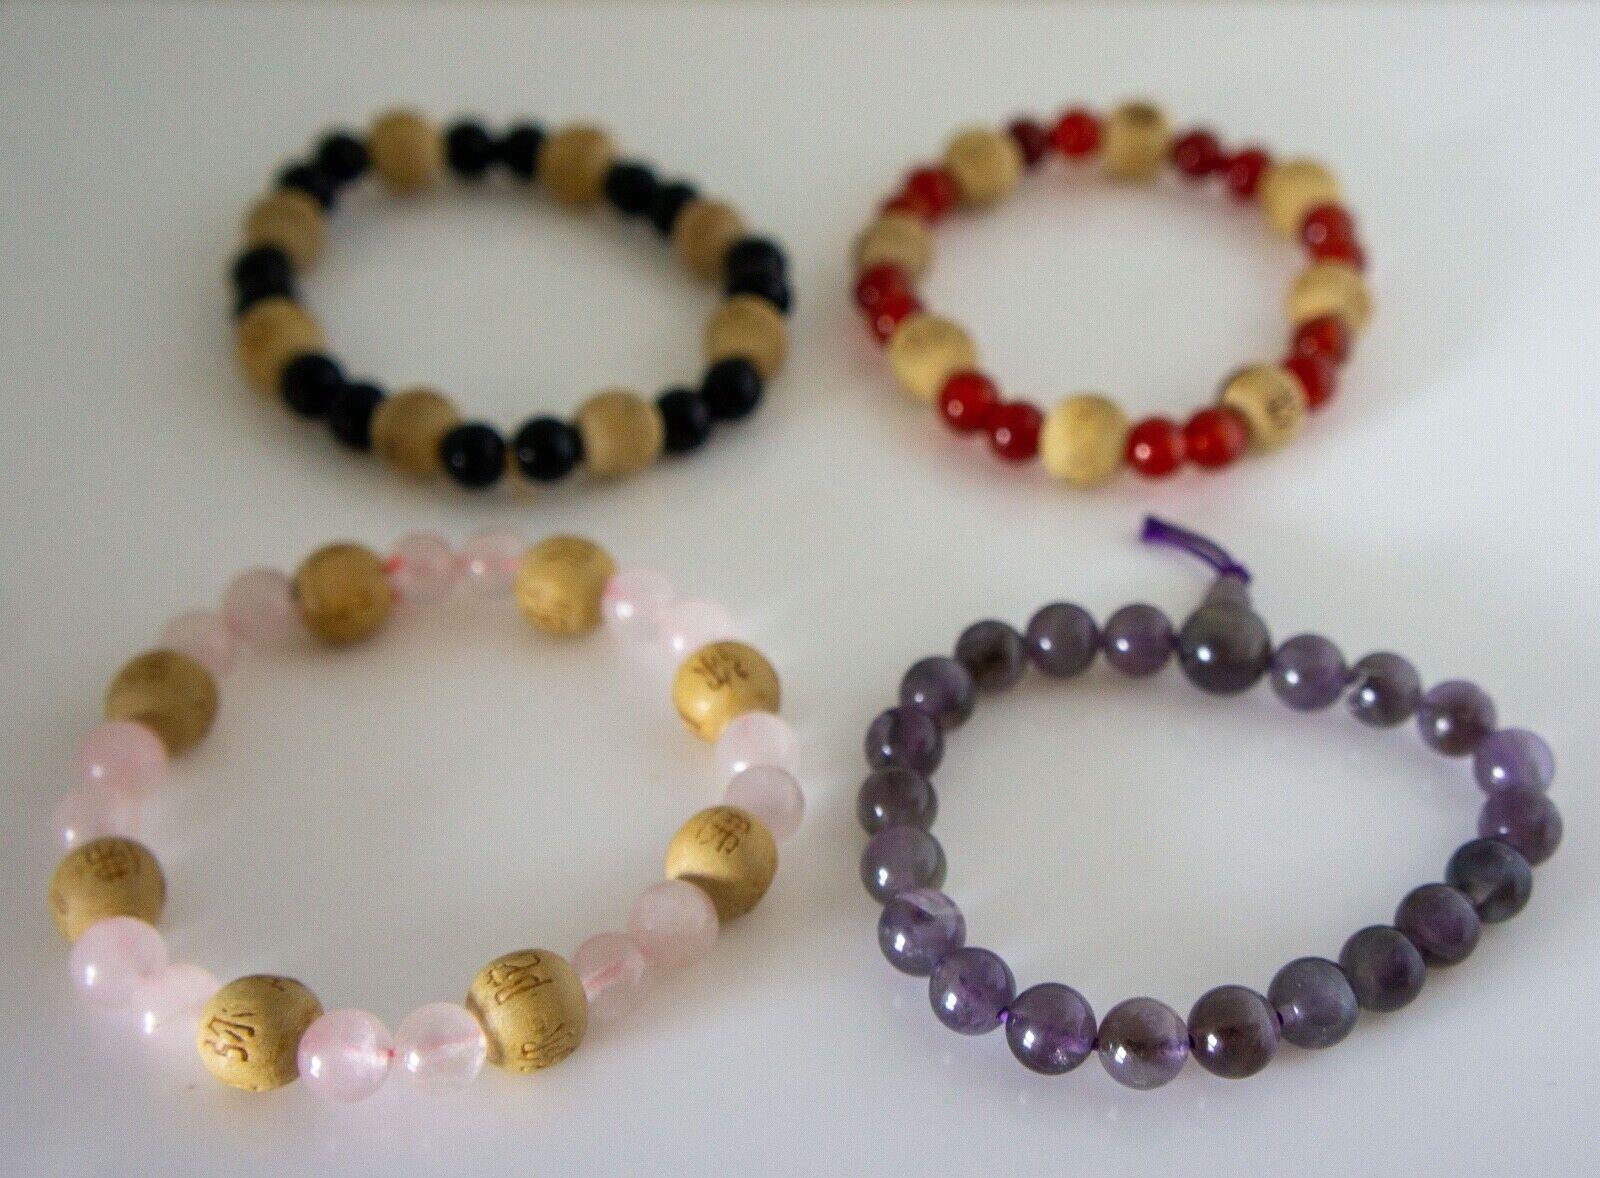 Beaded Bracelets Stack, Feng Shui, 4PCS - image 3